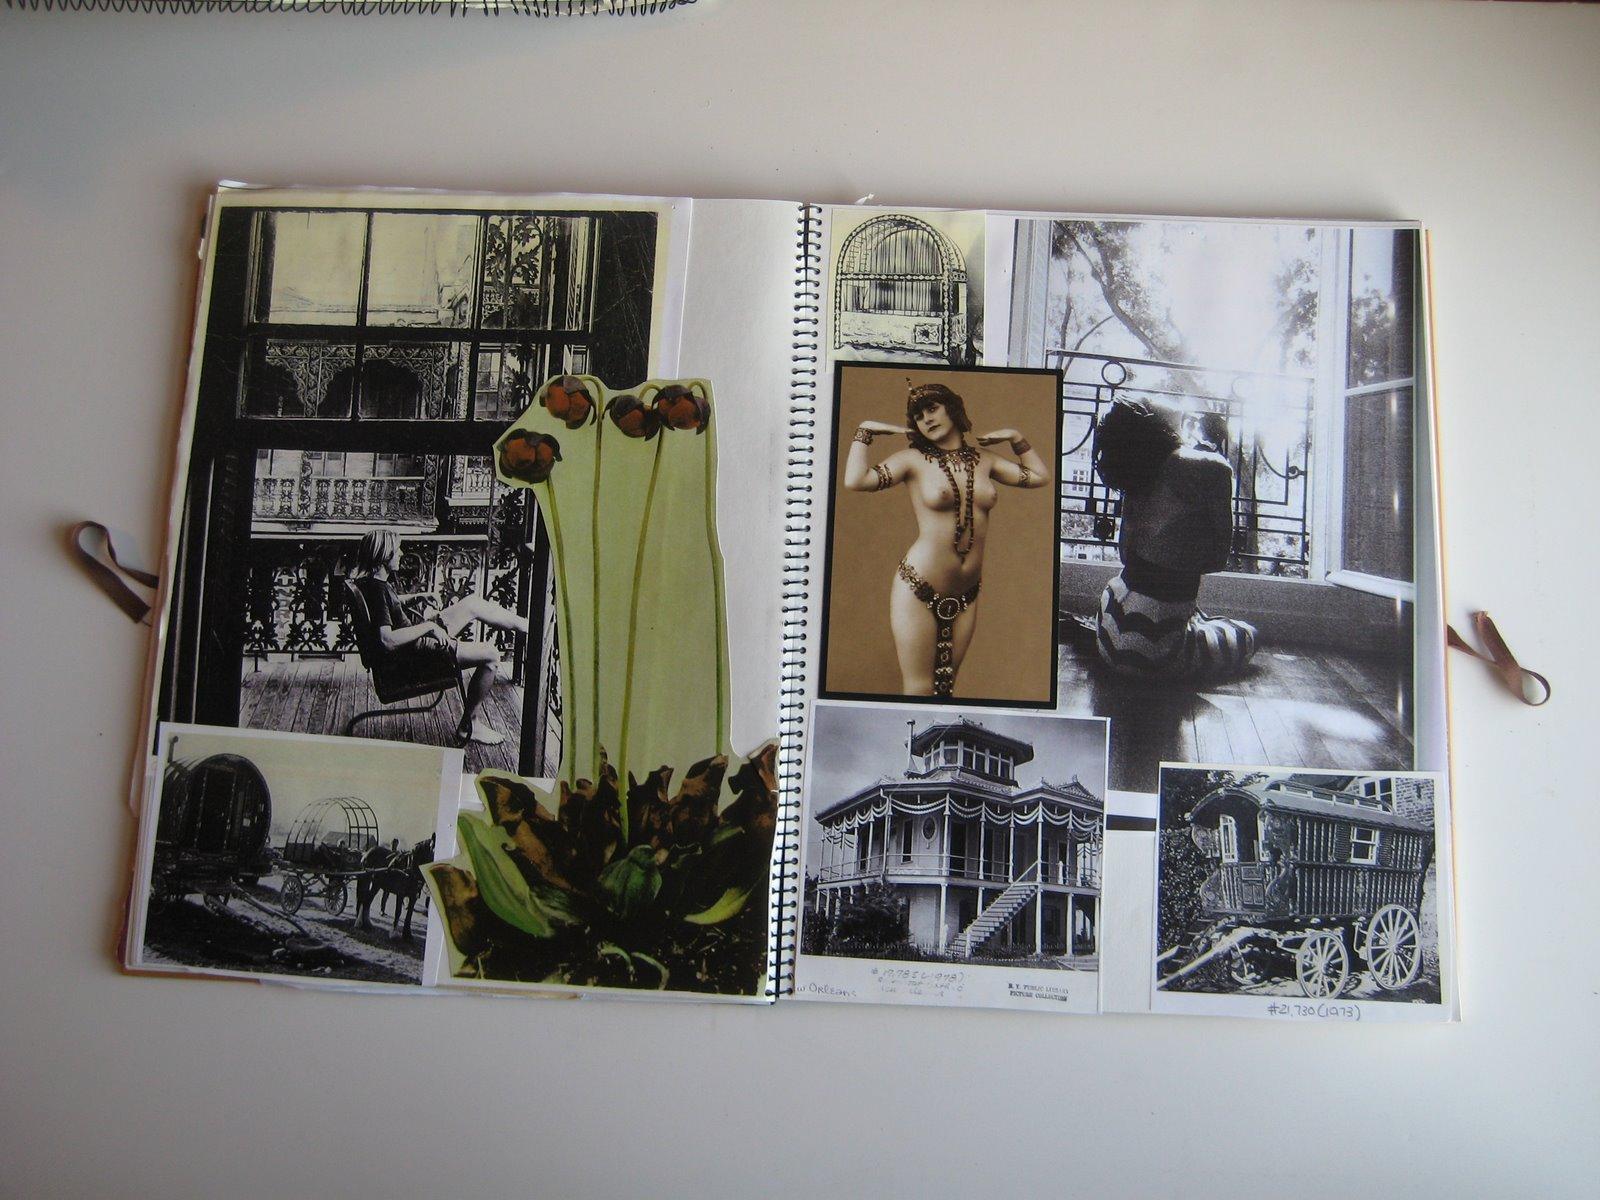 art-architech.blogspot.com / art-design and vintage